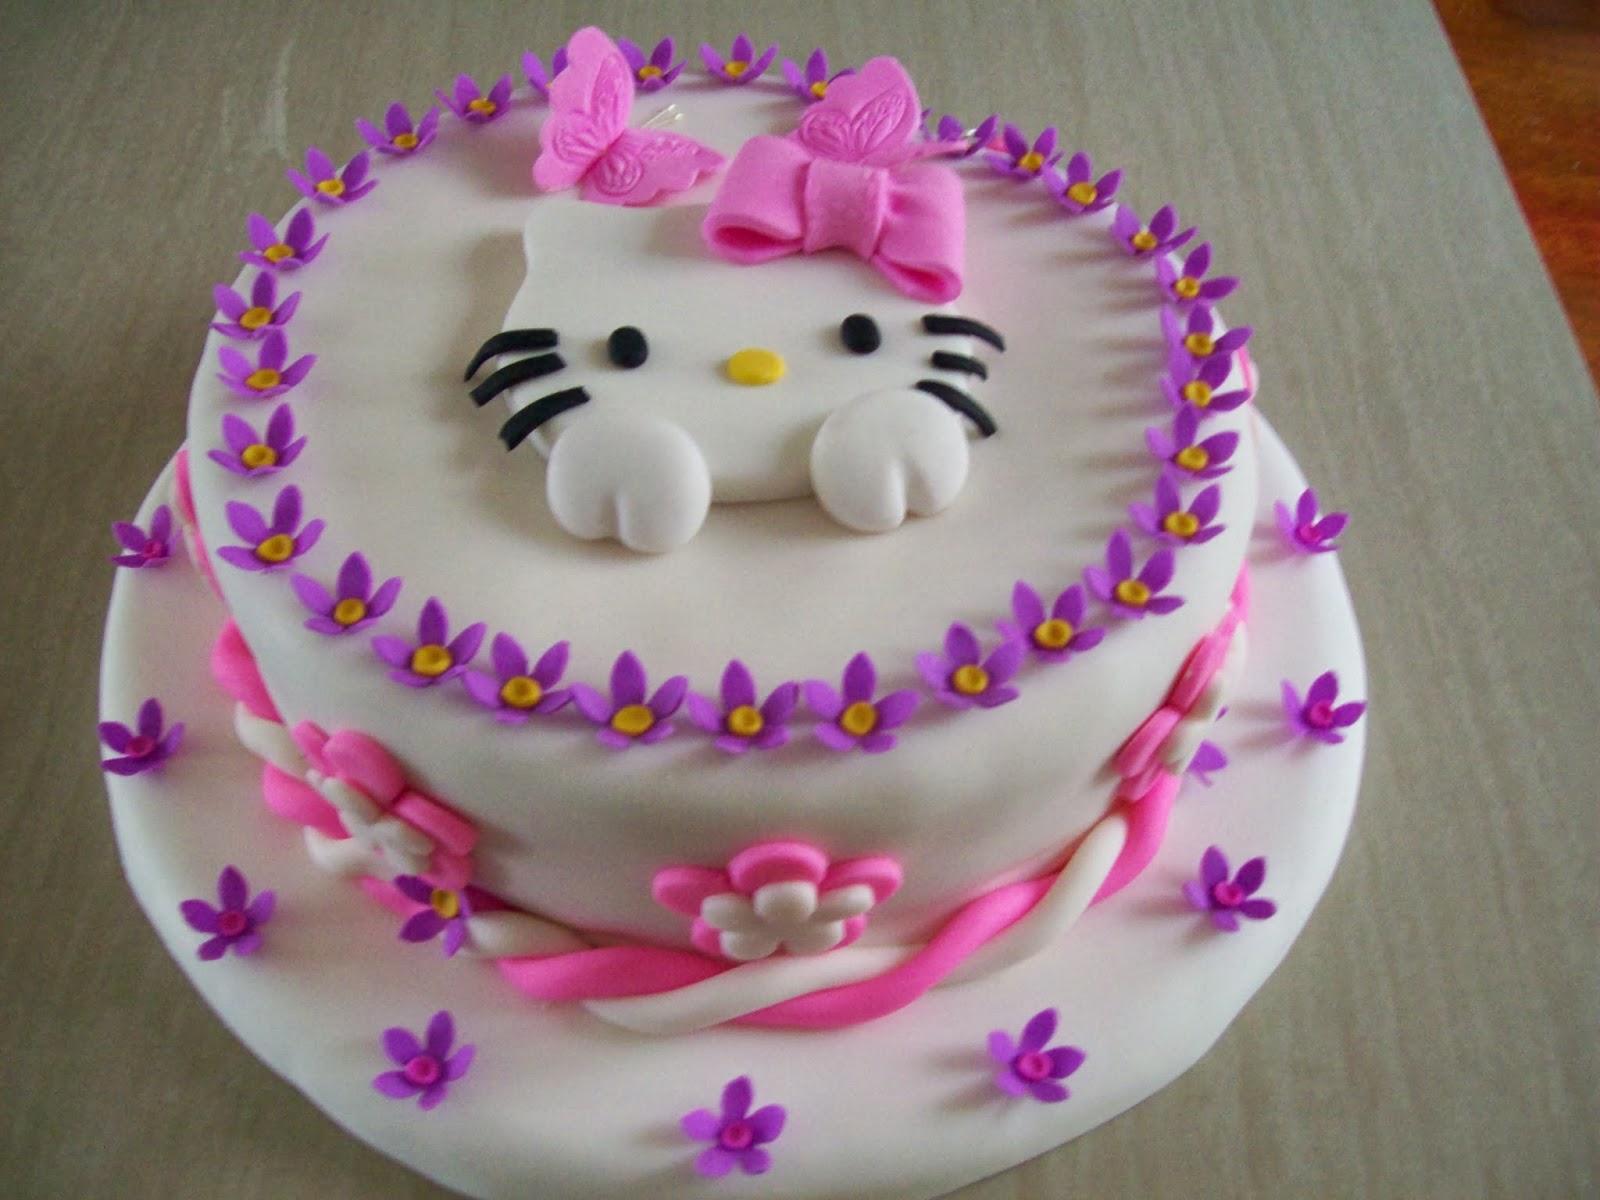 Kitty Decoracion De Tortas ~ Decoraci?n de torta de Hello Kitty  Imagui